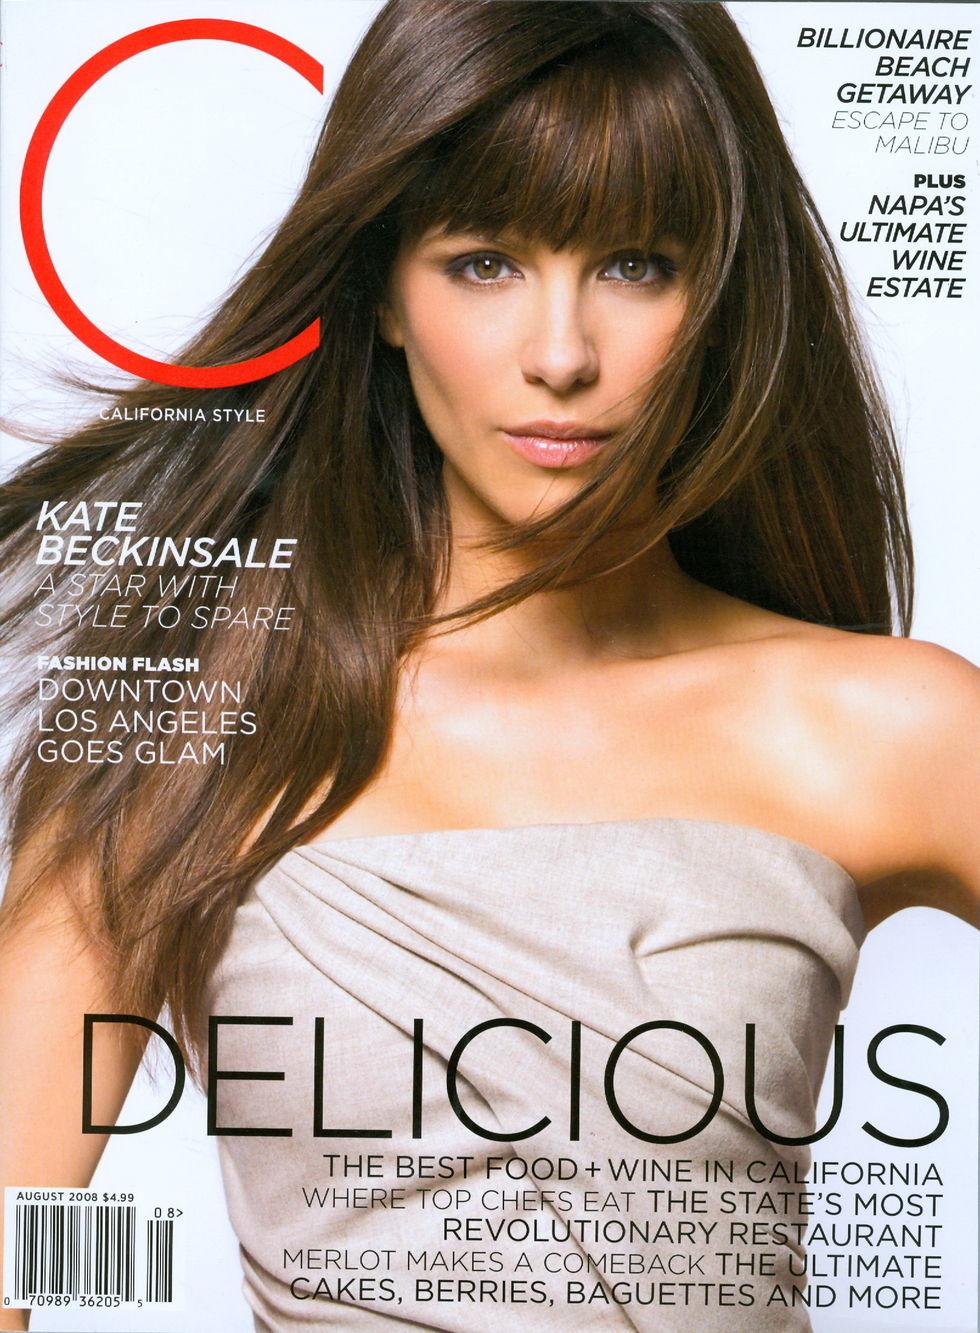 kate-beckinsale-california-style-magazine-august-2008-01